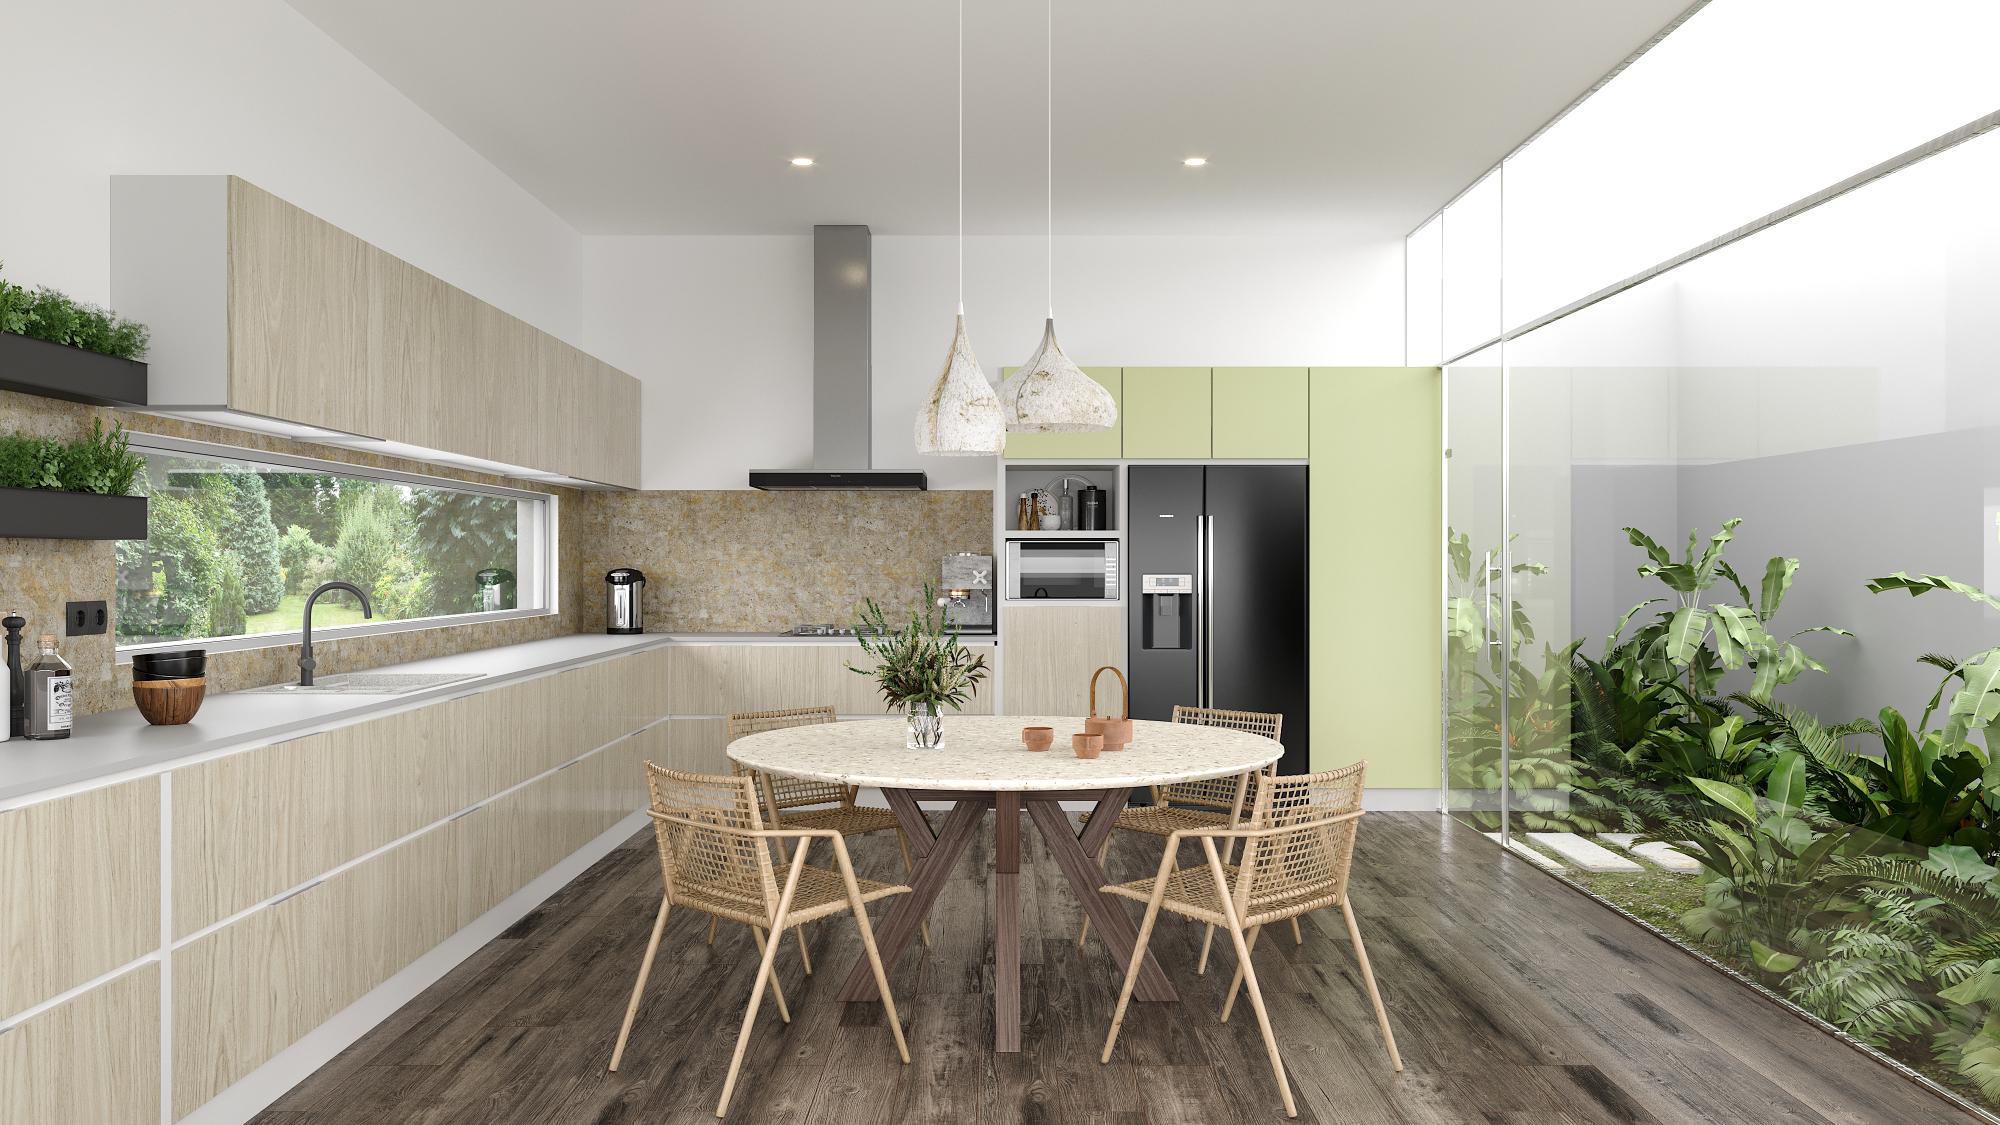 4-Trend-Videos-2020/21-Restoration-Render-Green-Kitchen-Eclectic-Trends